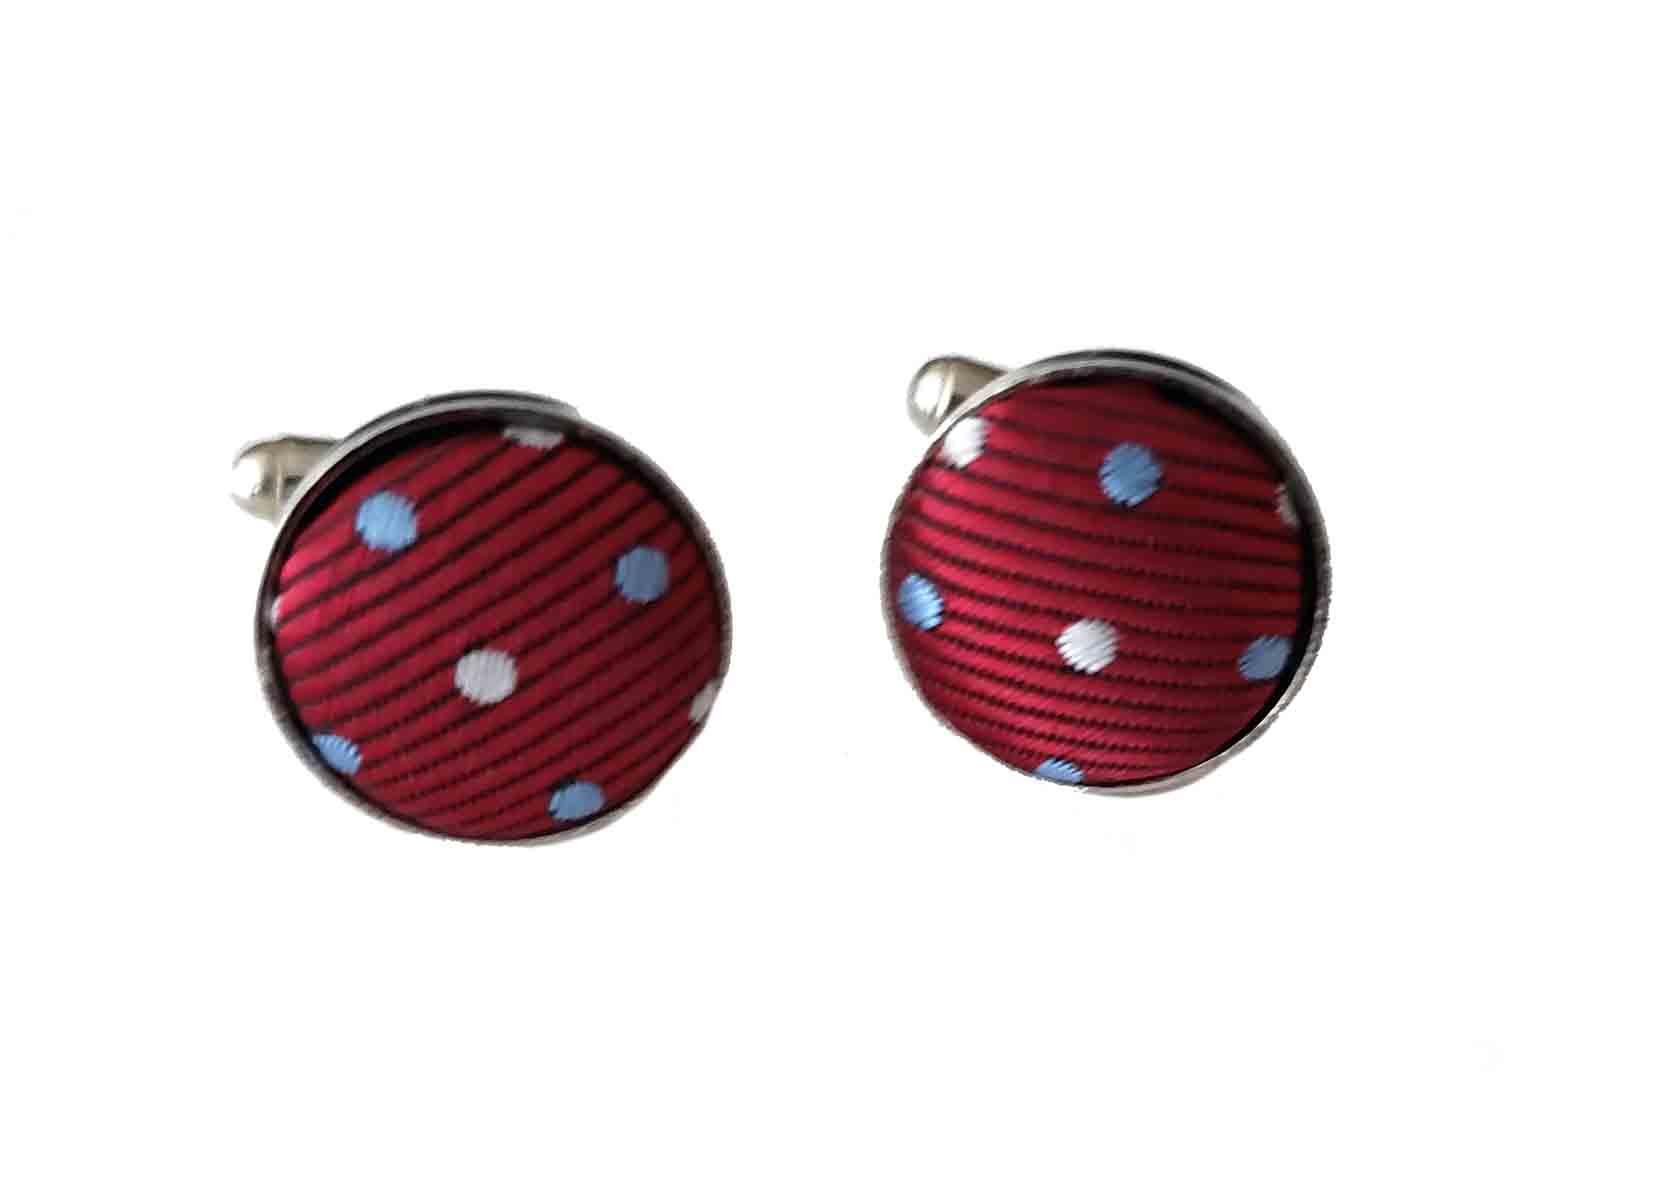 Gascoigne Cufflinks Metal Fabric Red Blue White Polka Dot Men's